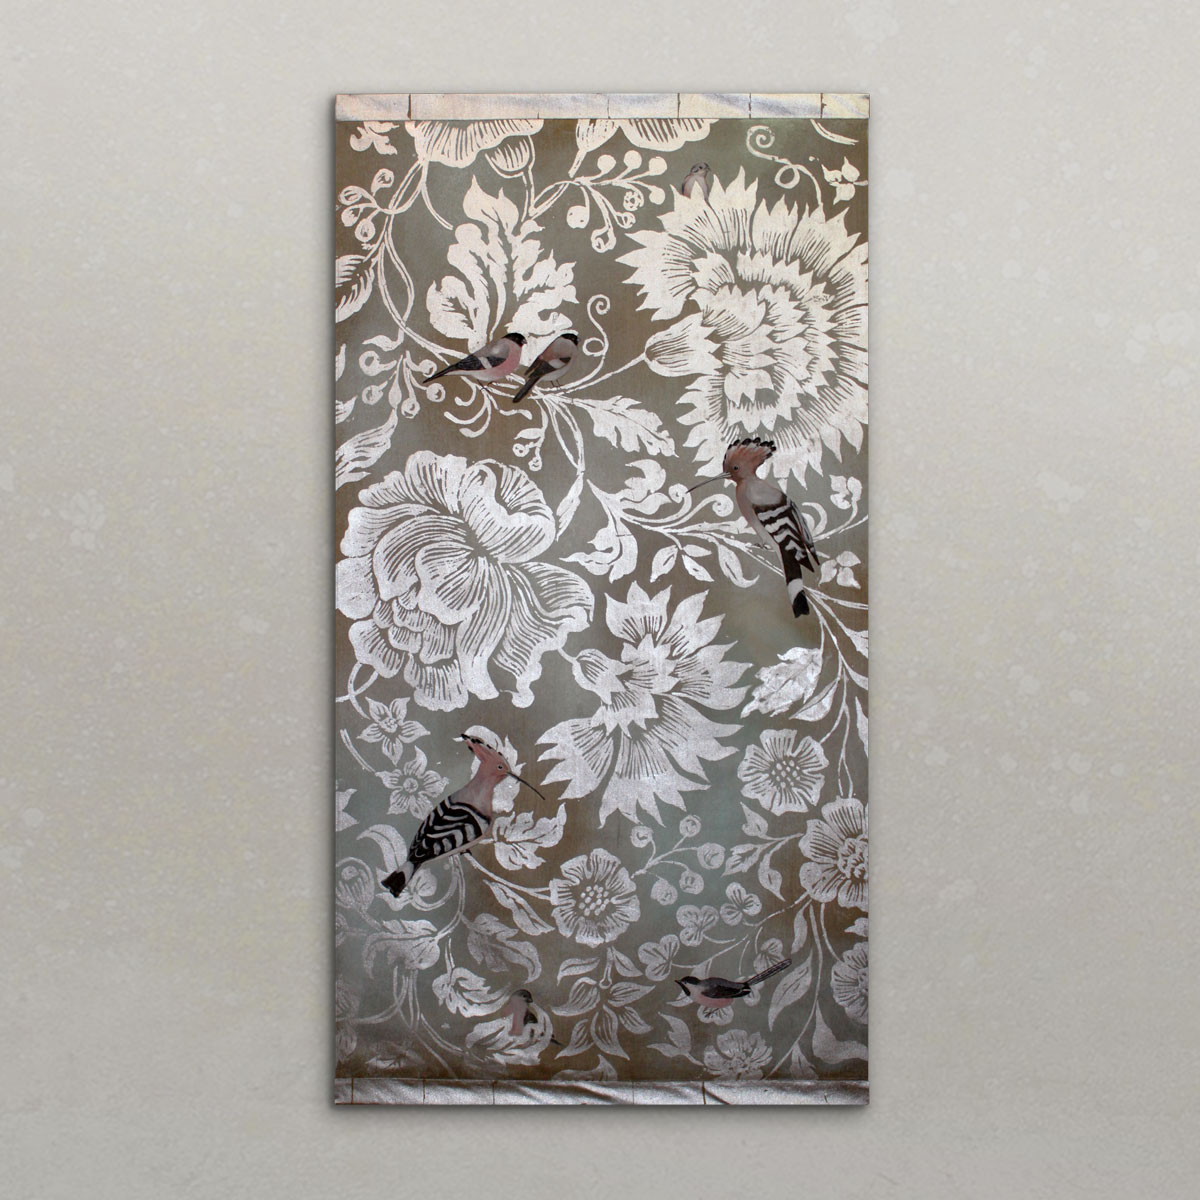 hector-atelier-galerie-oiseaux-argent-bis